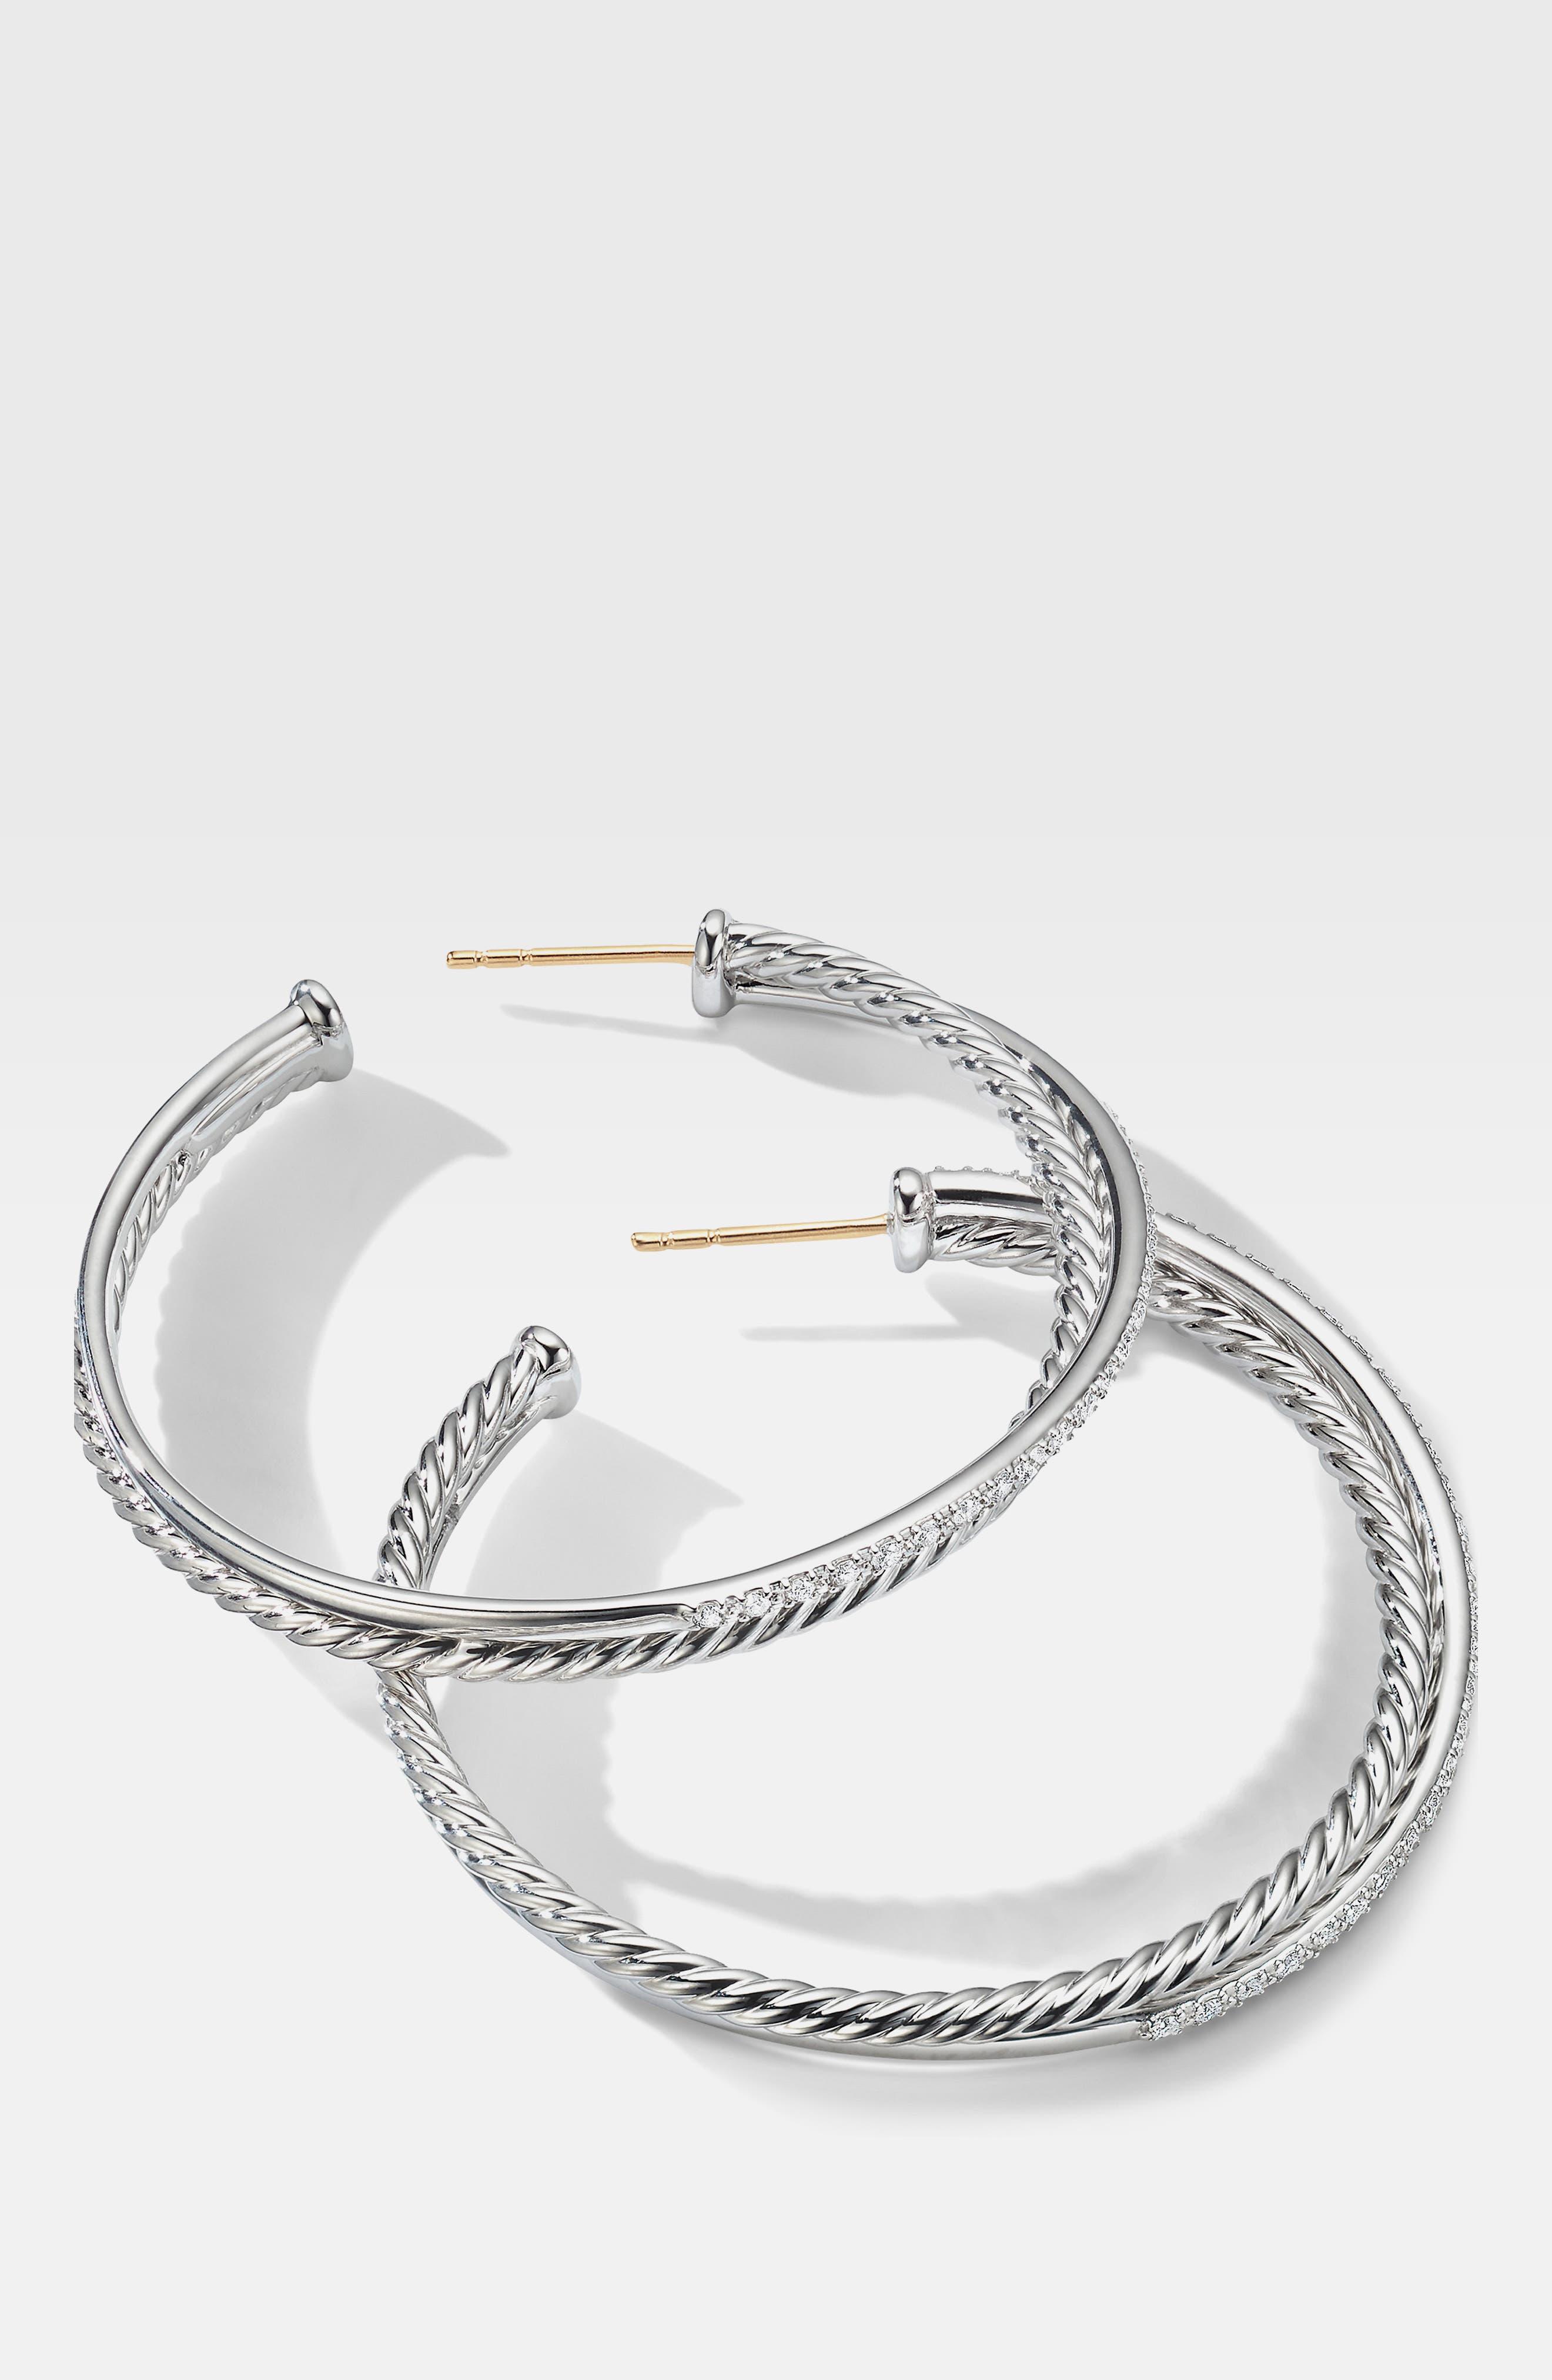 DAVID YURMAN, Extra Large Crossover Hoop Earrings with Diamonds, Alternate thumbnail 2, color, SILVER/ DIAMOND